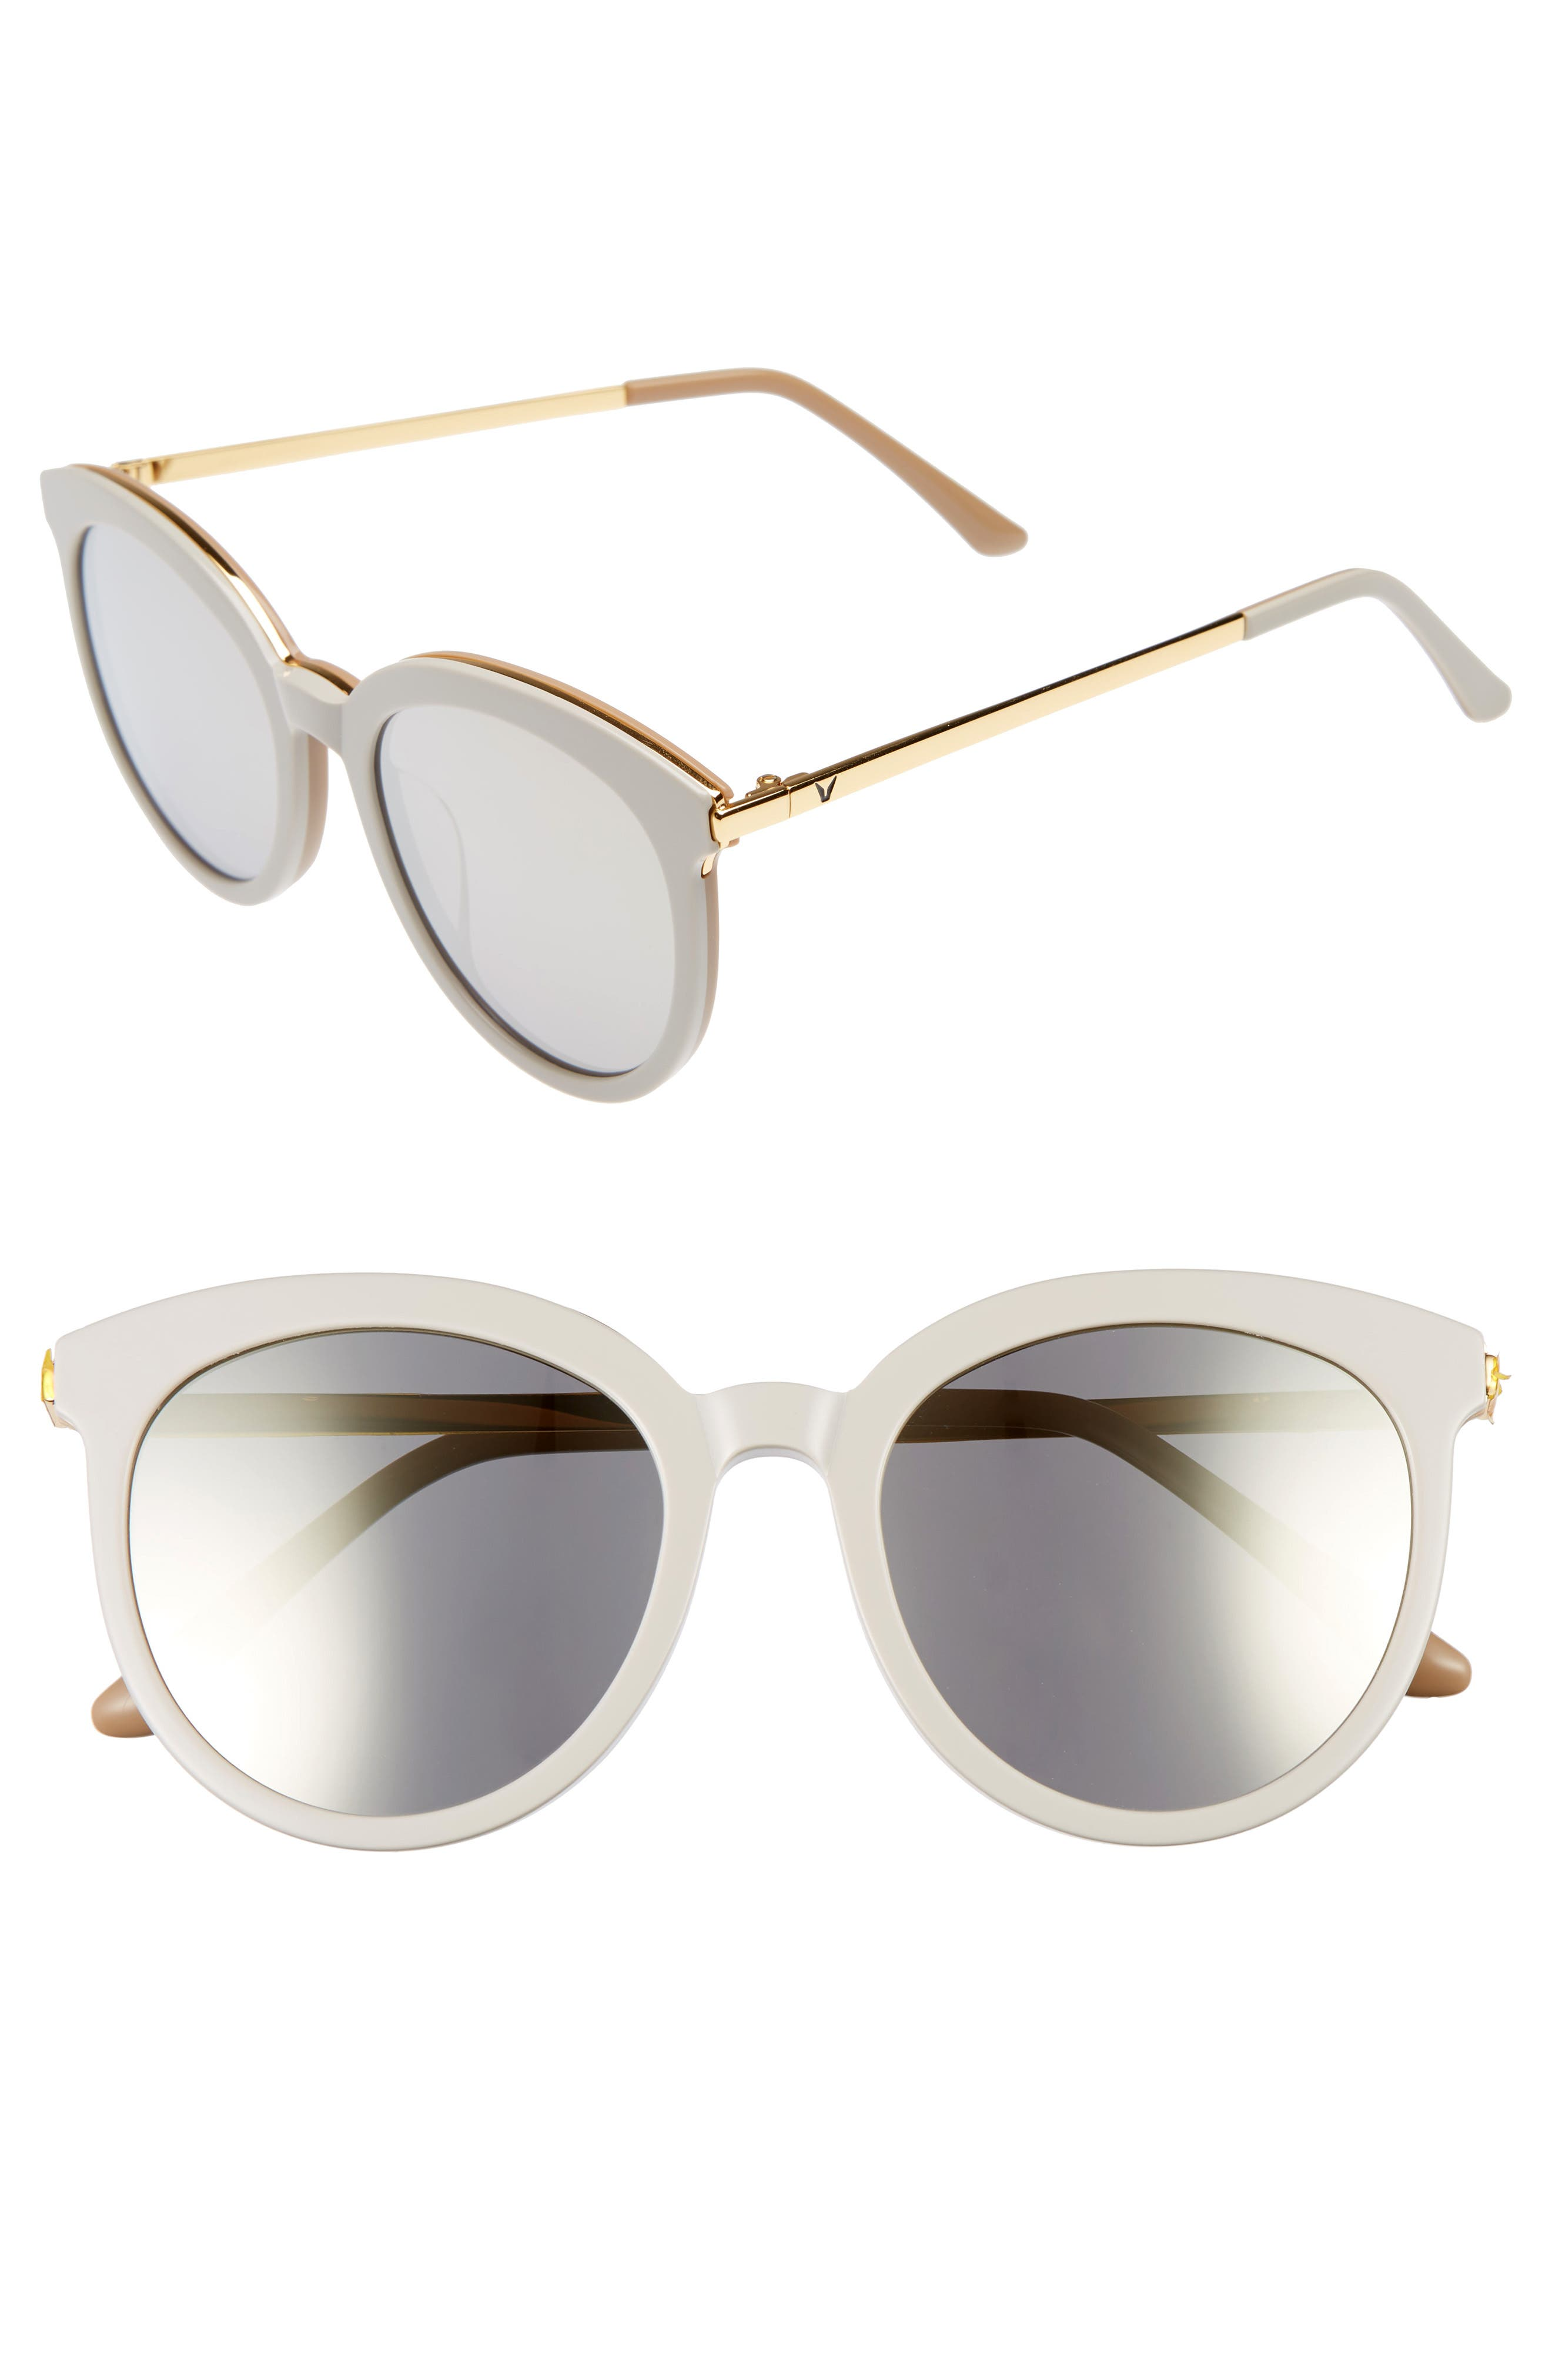 Vanilla Road 54mm Rounded Sunglasses,                             Main thumbnail 1, color,                             020